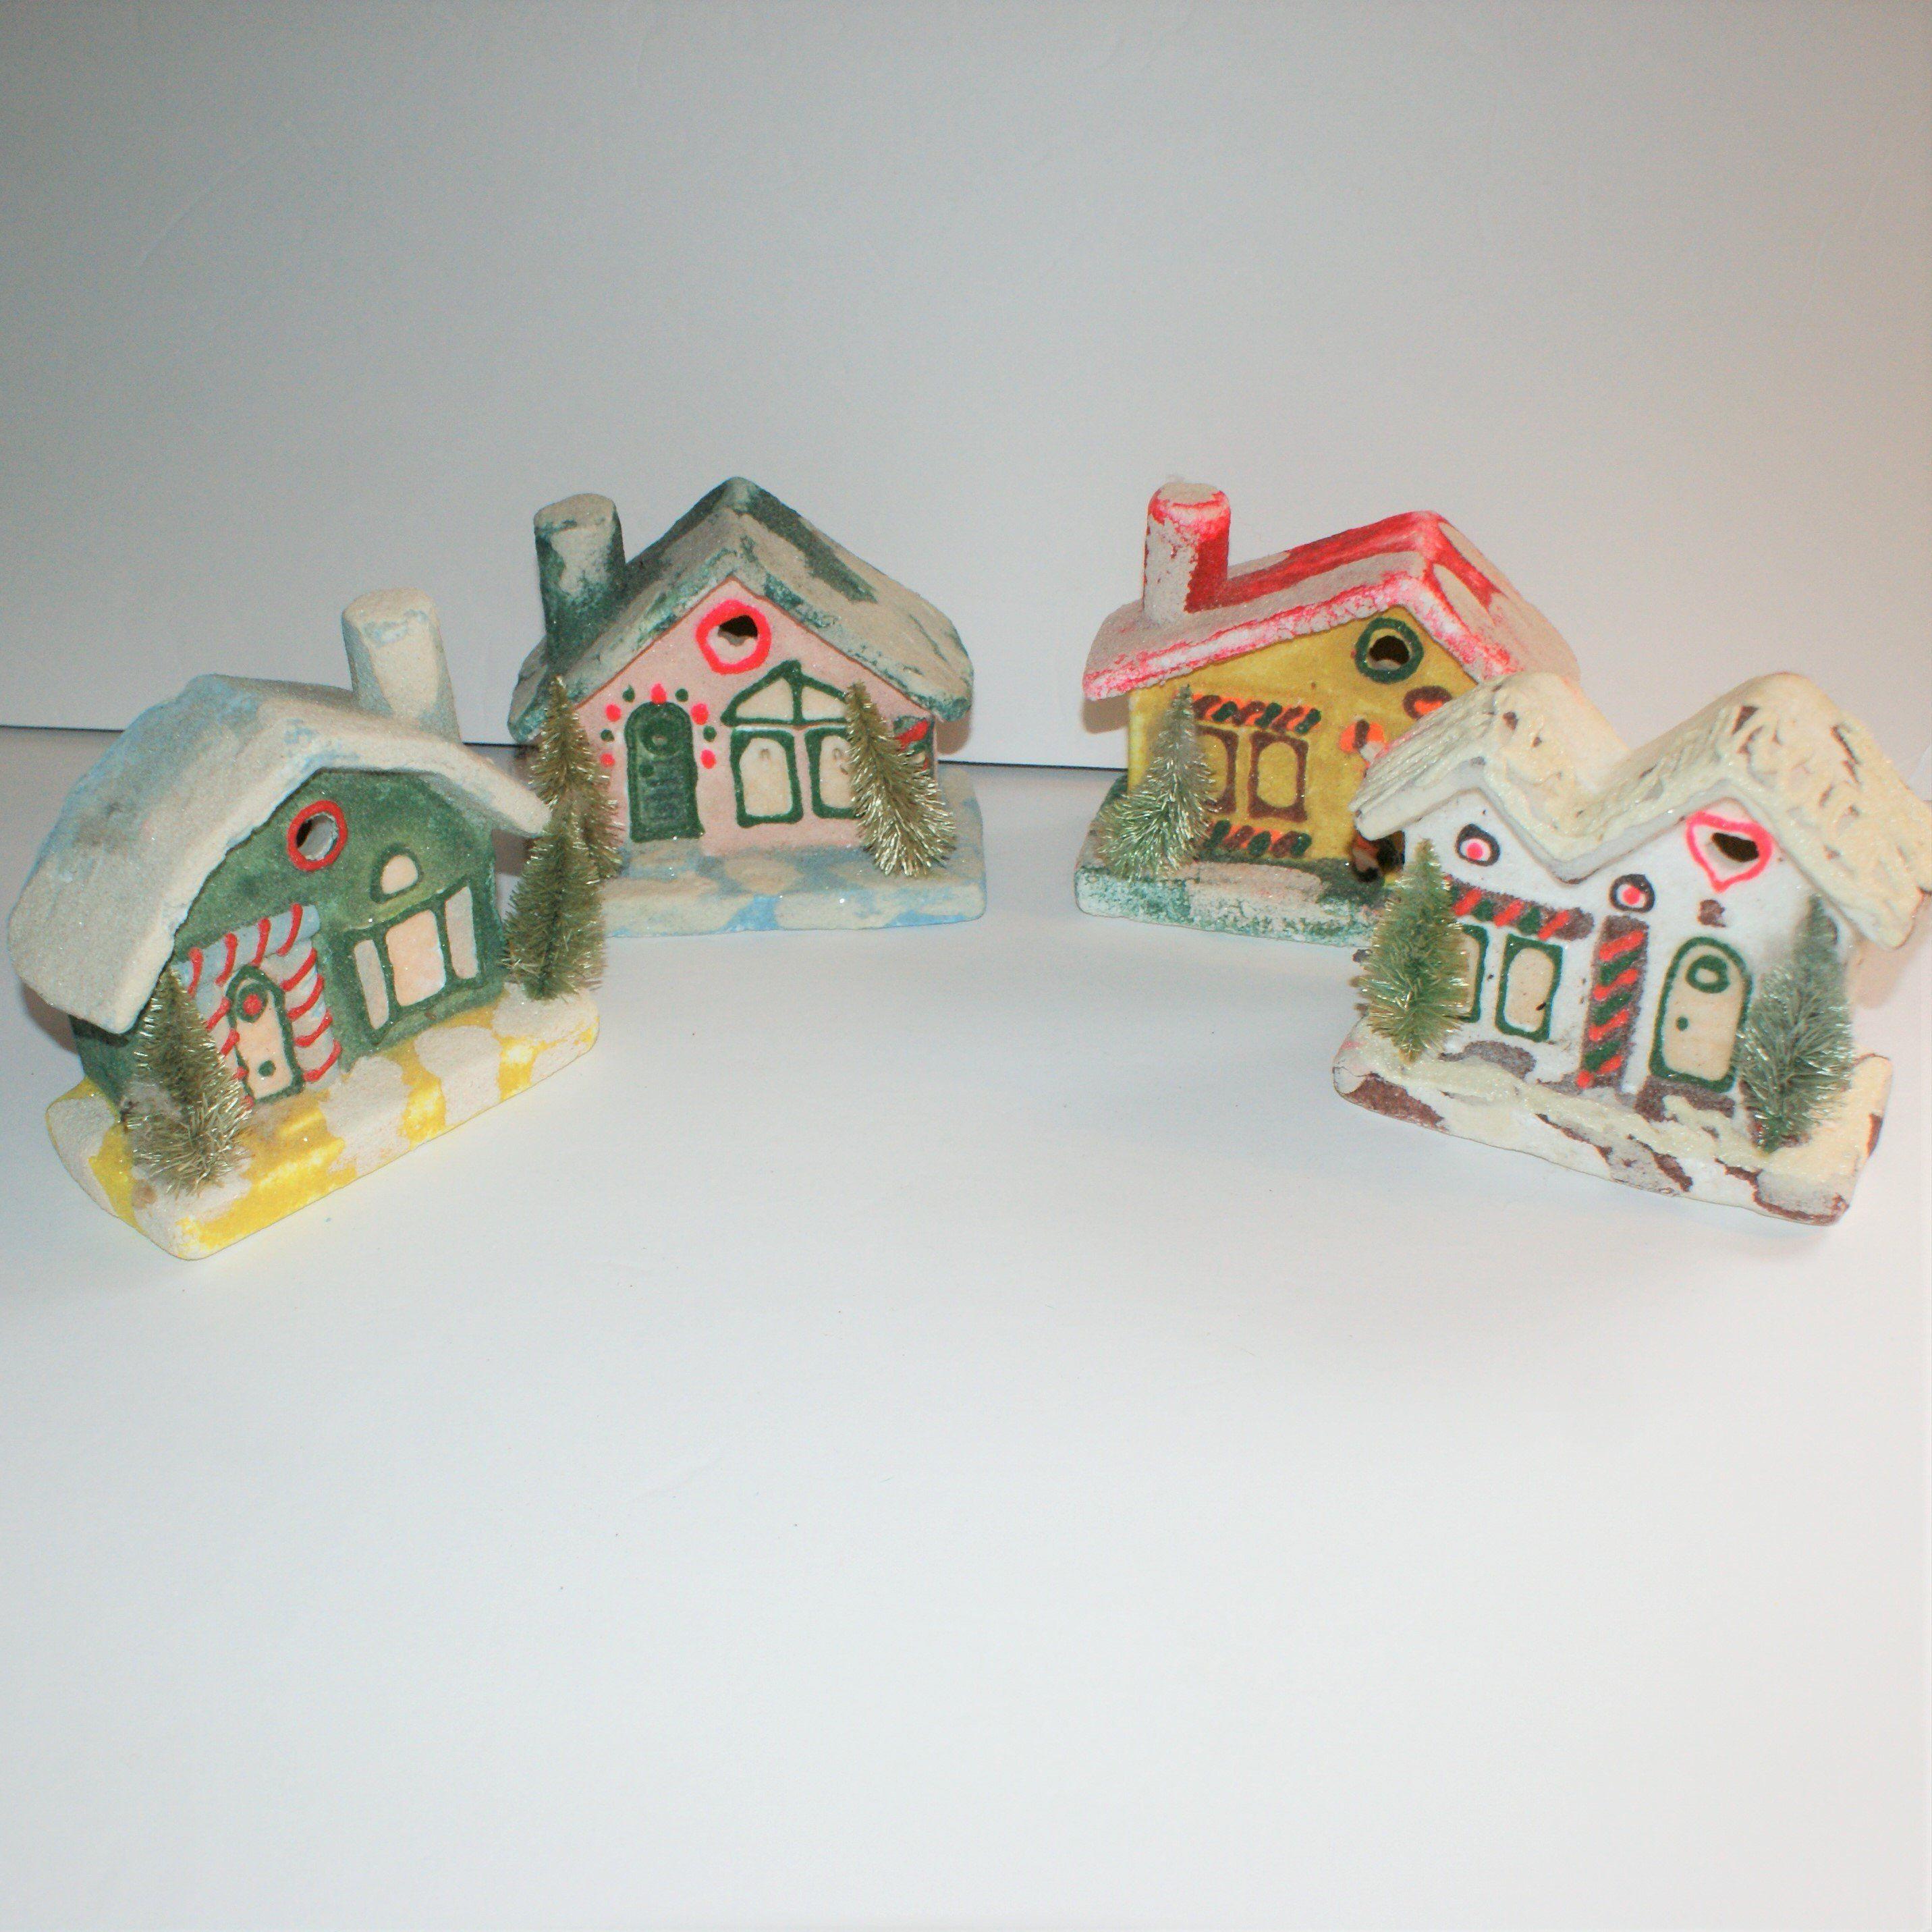 Vintage Village House Lot Of 4 Glitter Paint Foam Bottle Brush Etsy Glitter Paint Bottle Brush Trees Vintage Birthday Cards